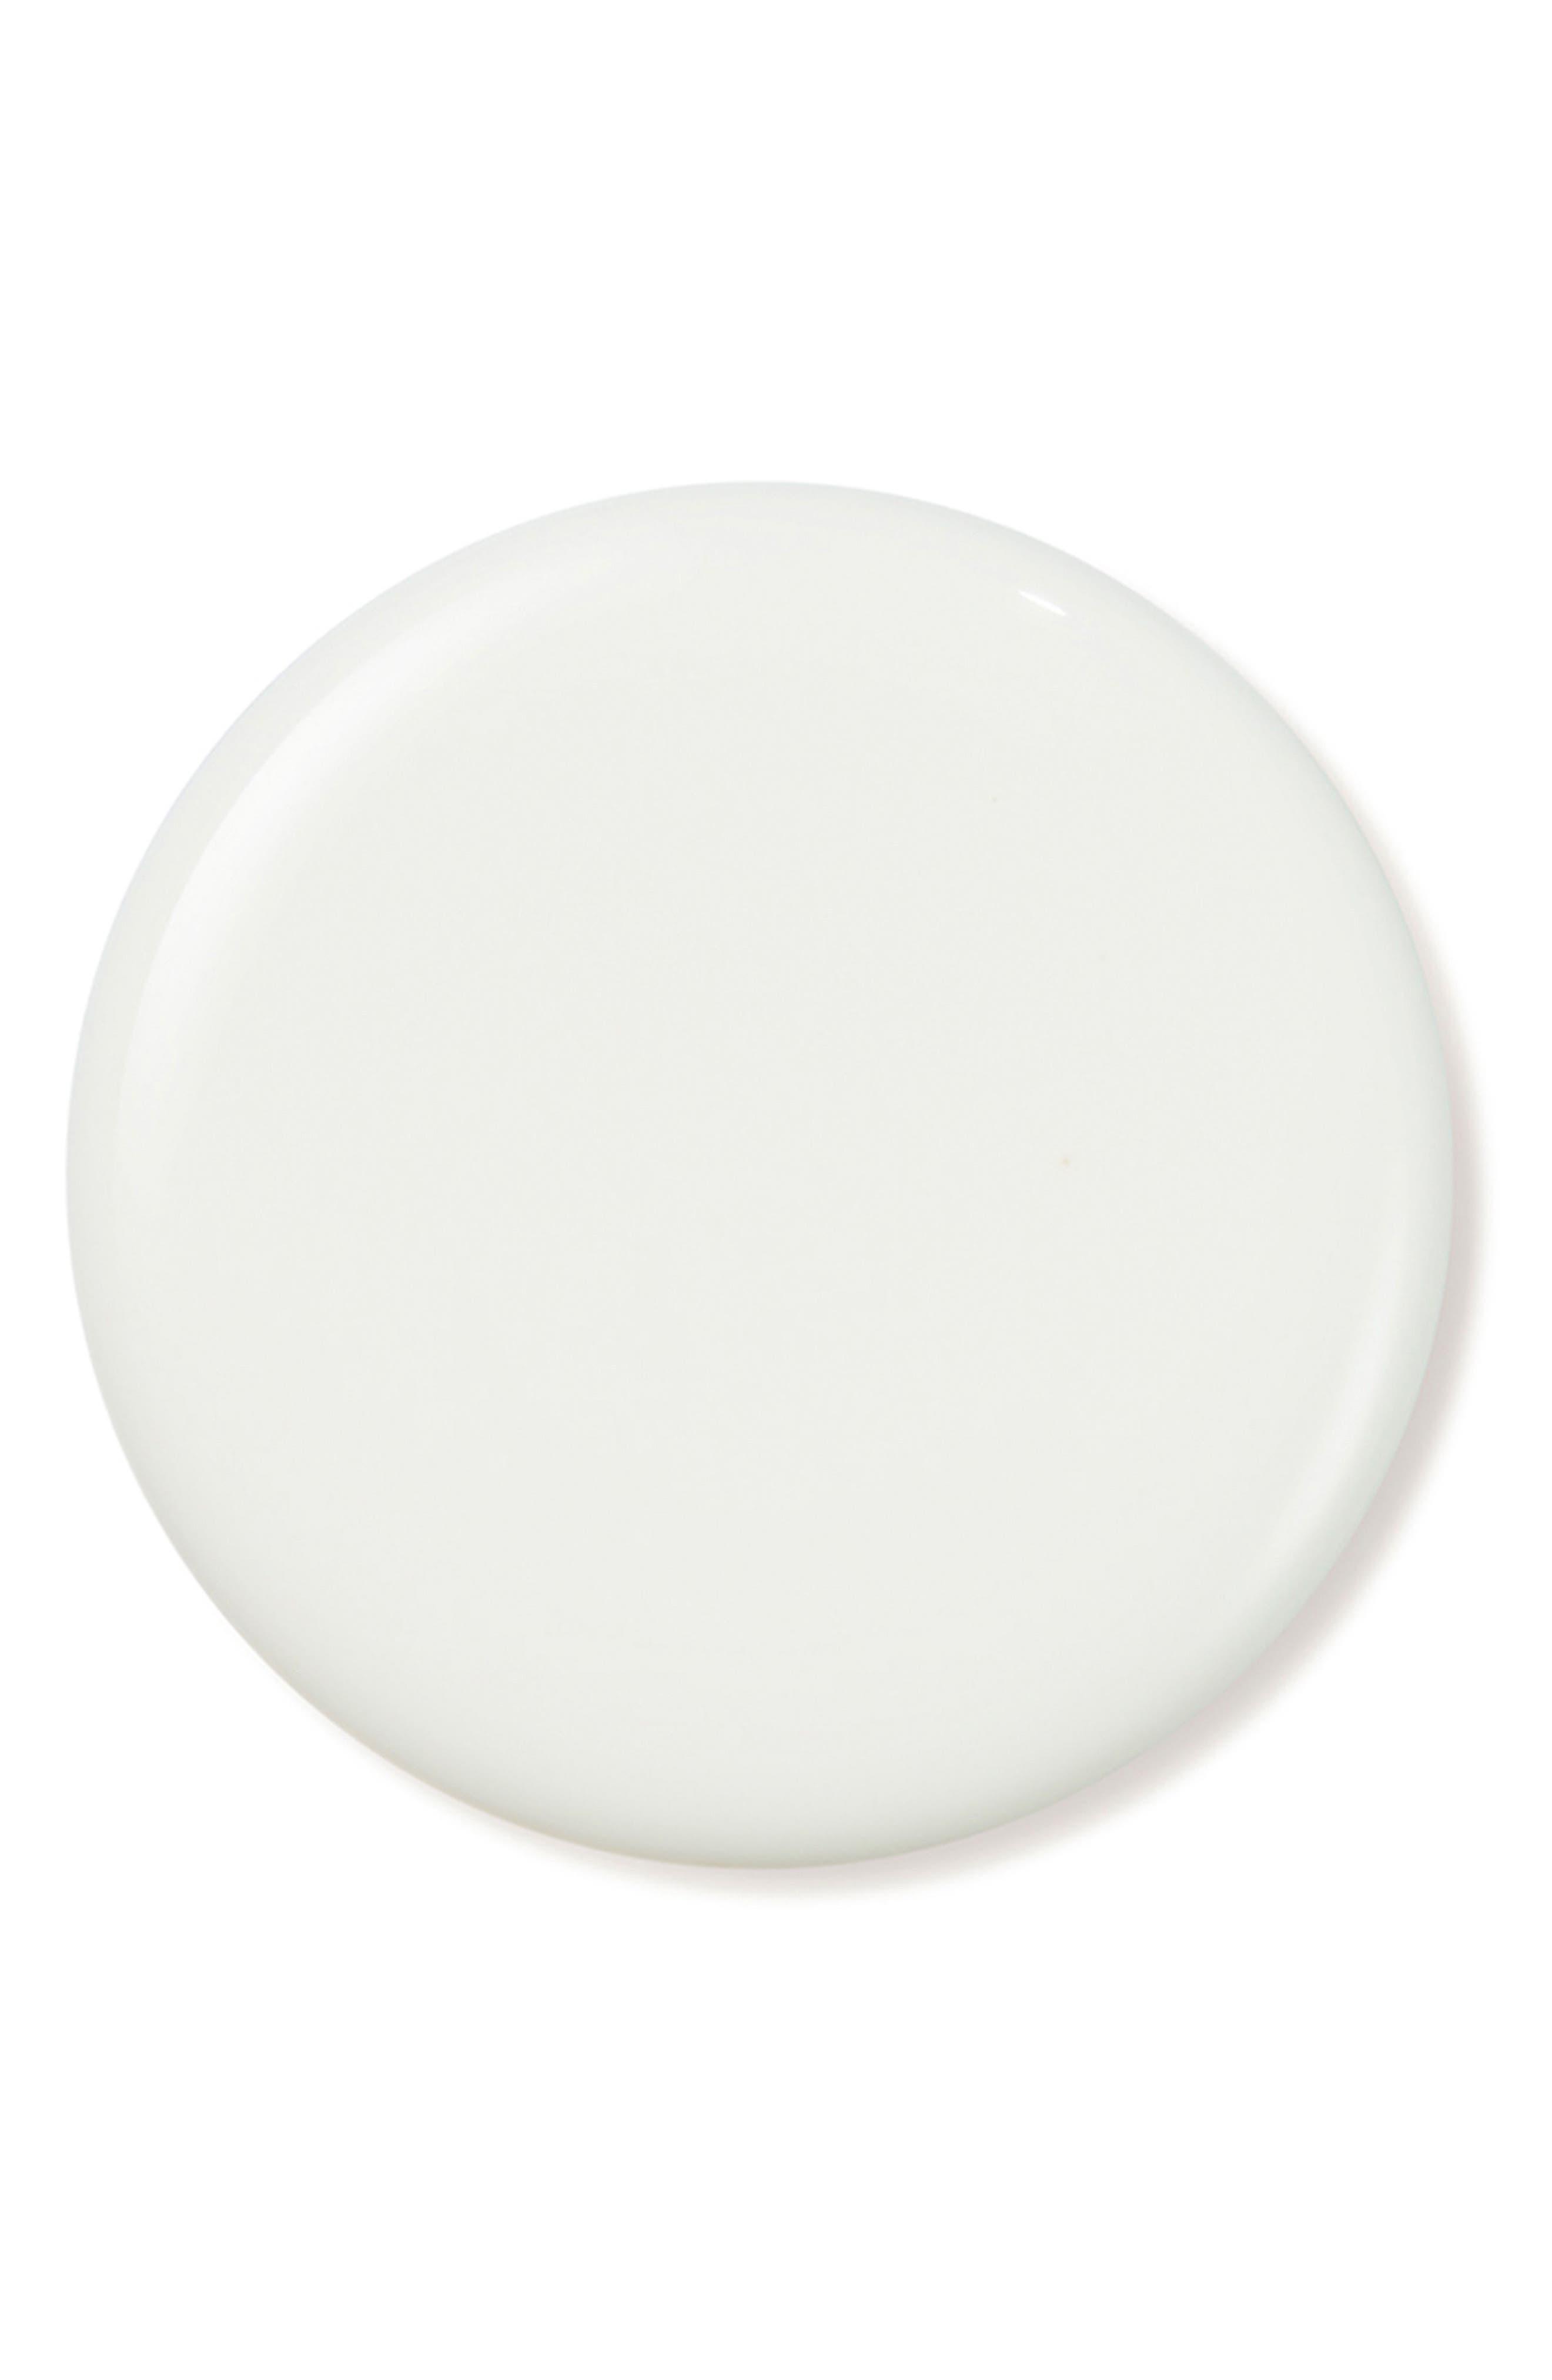 Urban Environment Oil-Free UV Protector Broad Spectrum SPF 42,                             Alternate thumbnail 3, color,                             NO COLOR